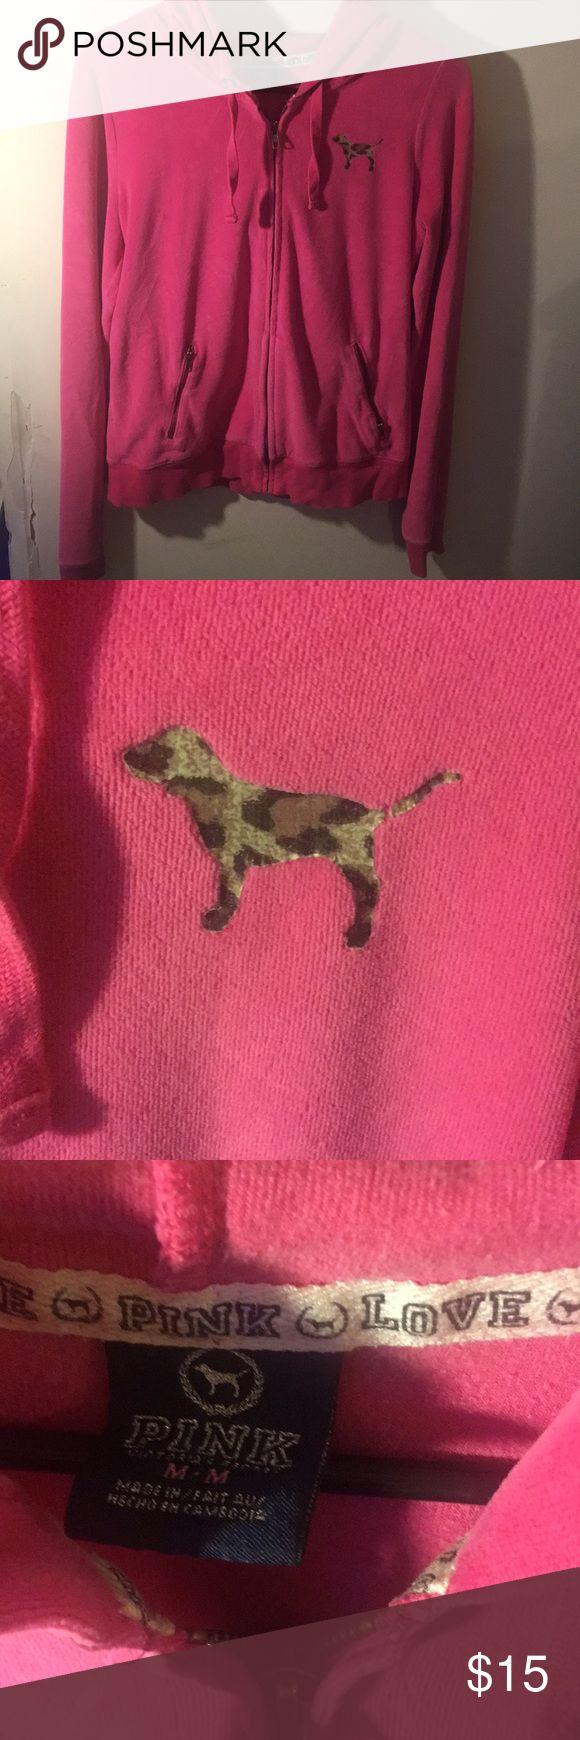 PINK Victoria's Secret hot pink zip up hoodie Cheetah print dog on the front with PINK in animal print on the hood. Size medium. PINK Victoria's Secret Tops Sweatshirts & Hoodies